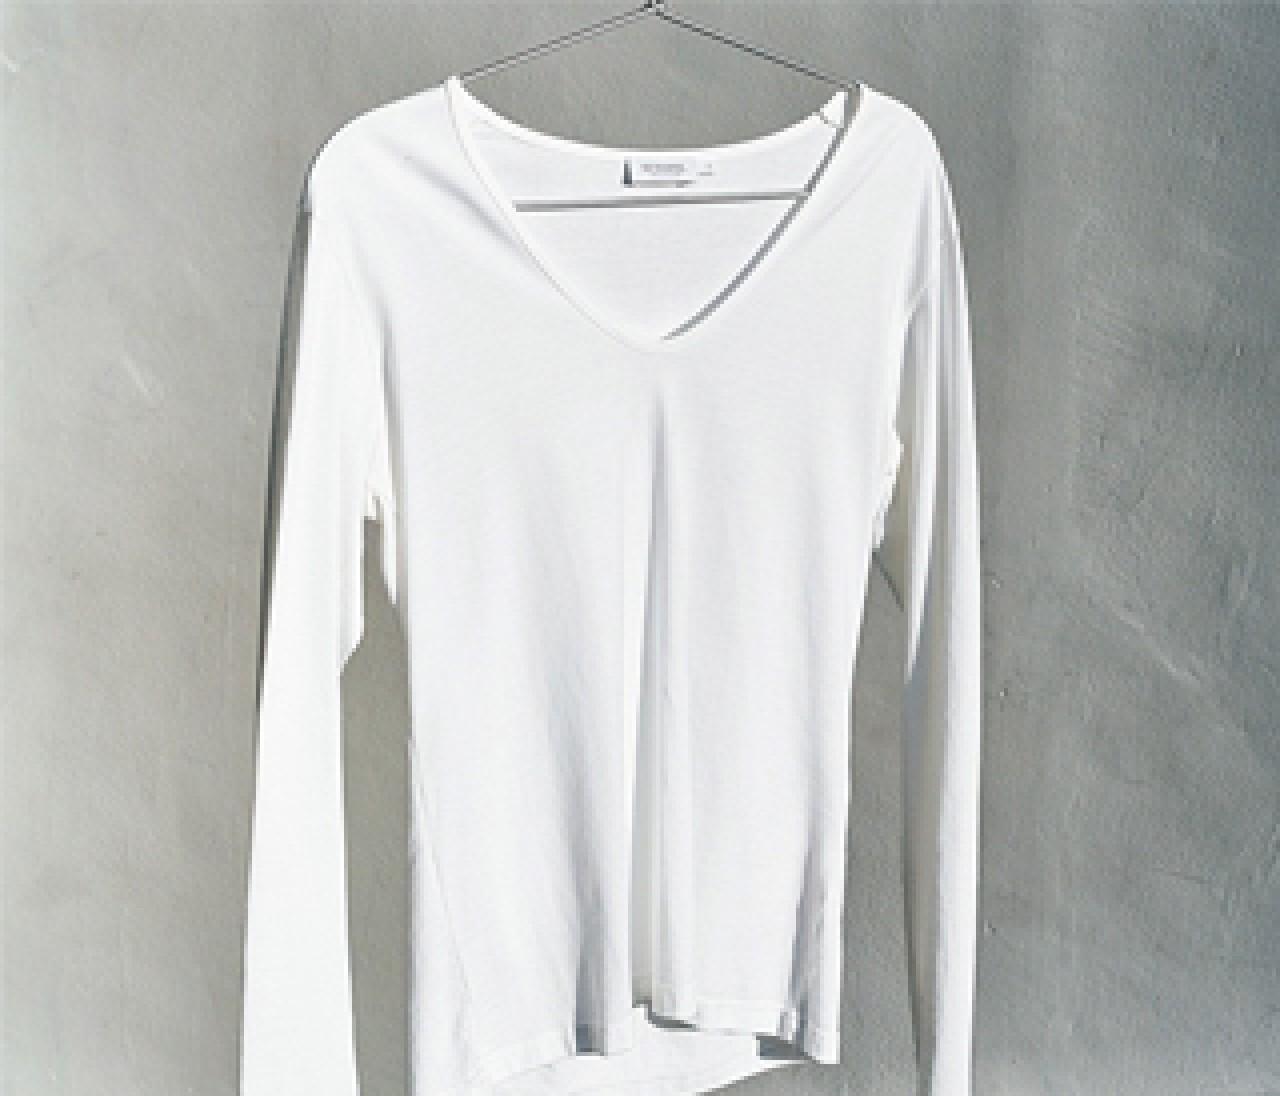 【Tシャツ・ワンピース・旬ニット】着やせ大賞に選ばれたブランドは?